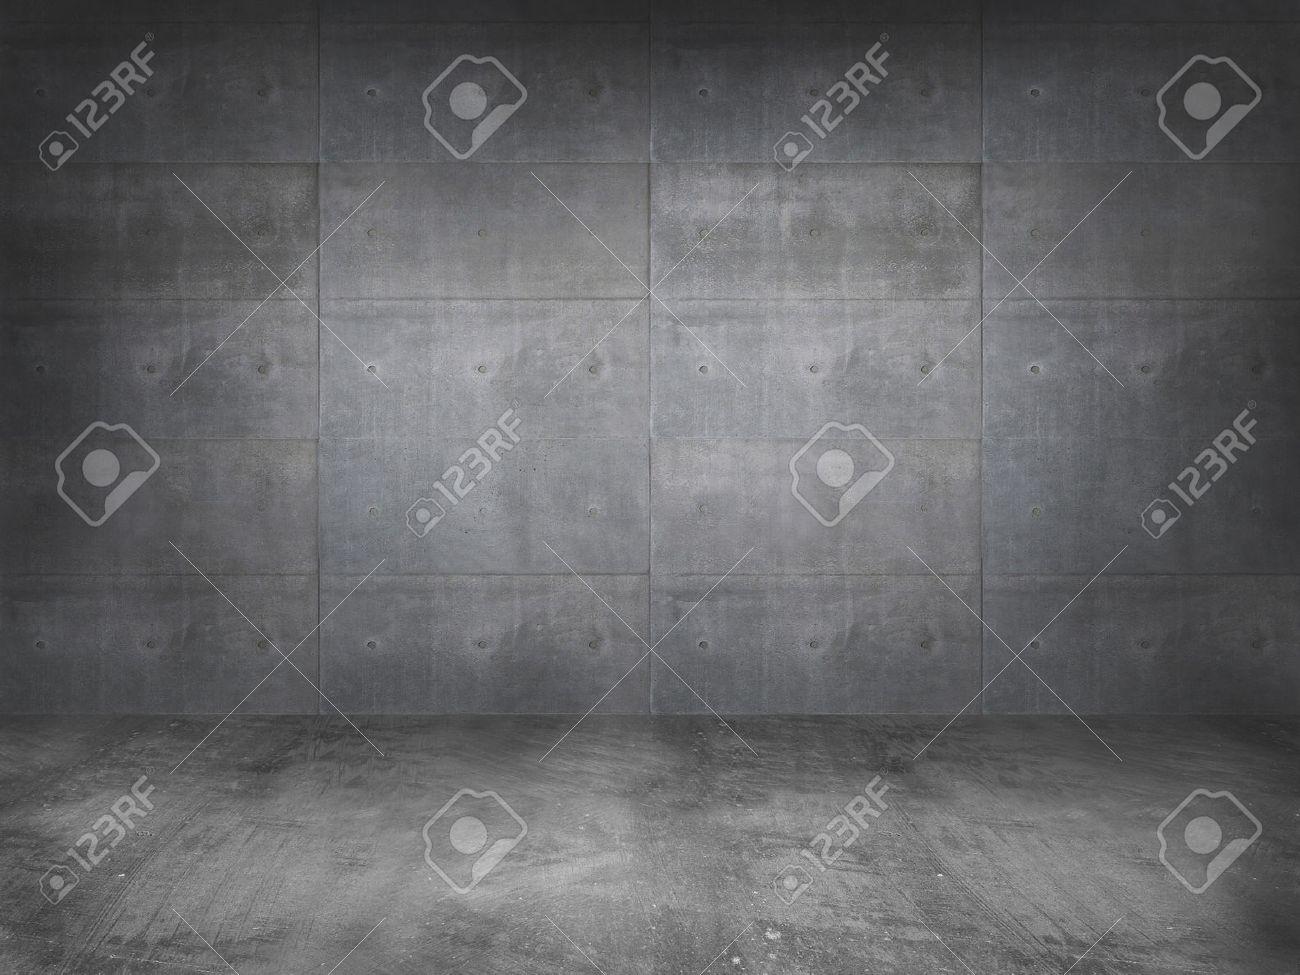 concrete wall with concrete floor,3d - 42558739